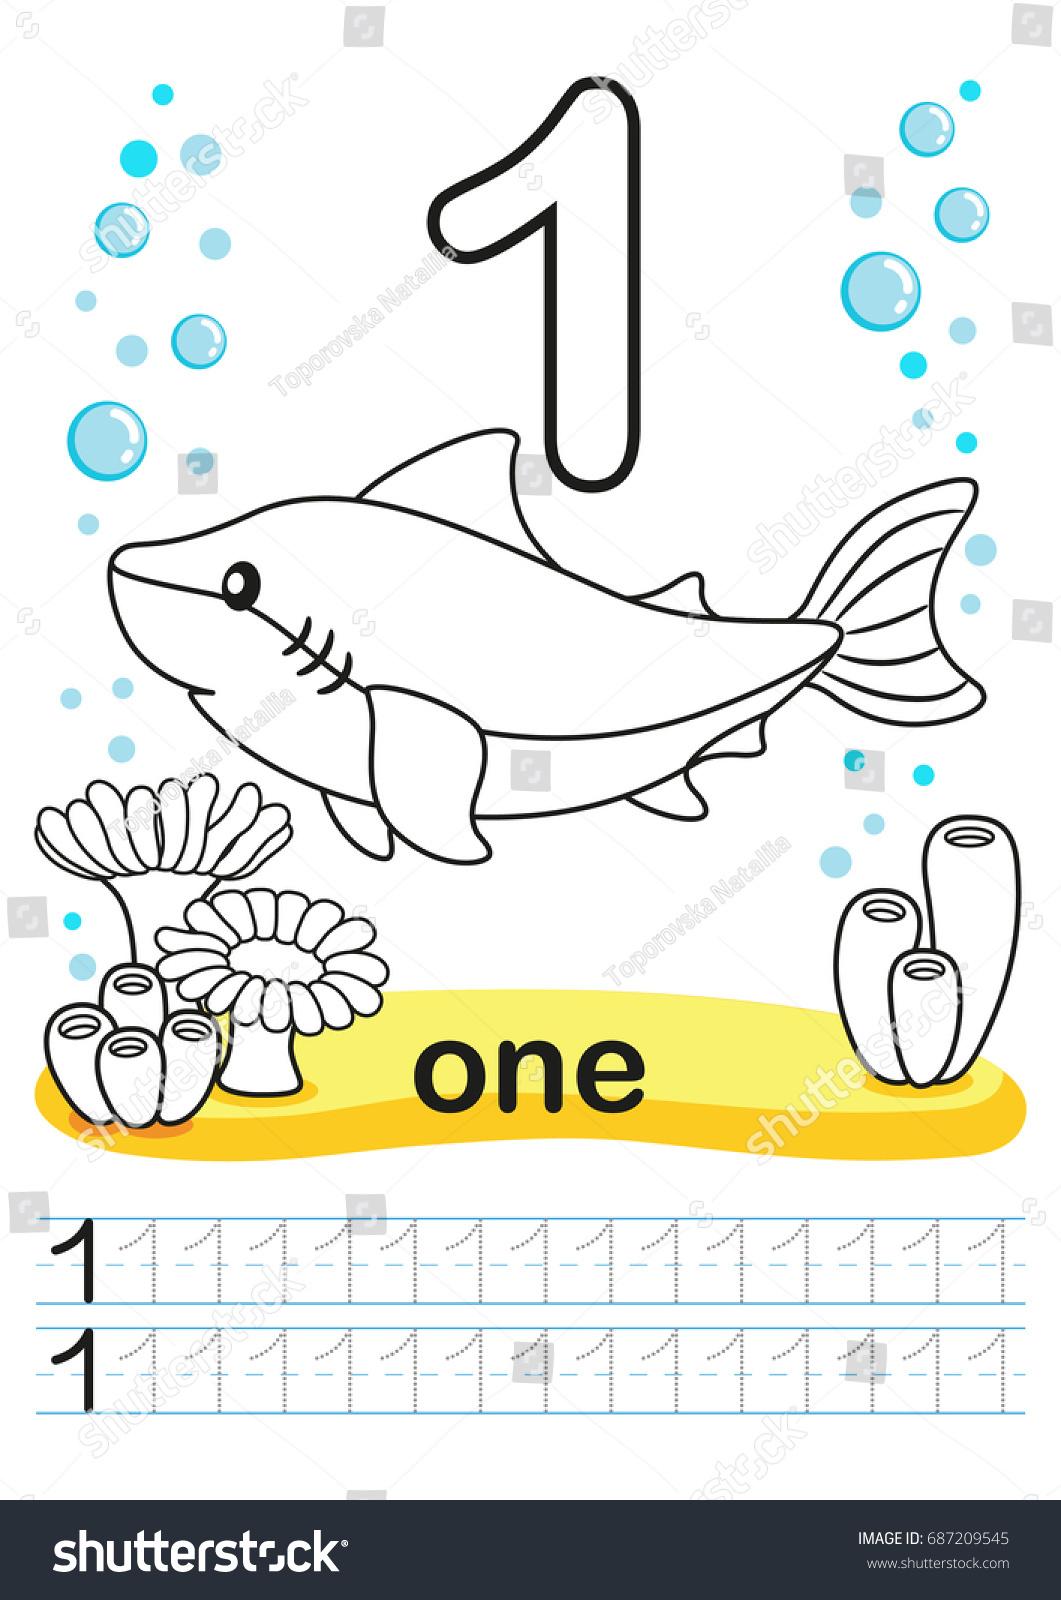 Coloring Printable Worksheet Kindergarten Preschool We Stock ...